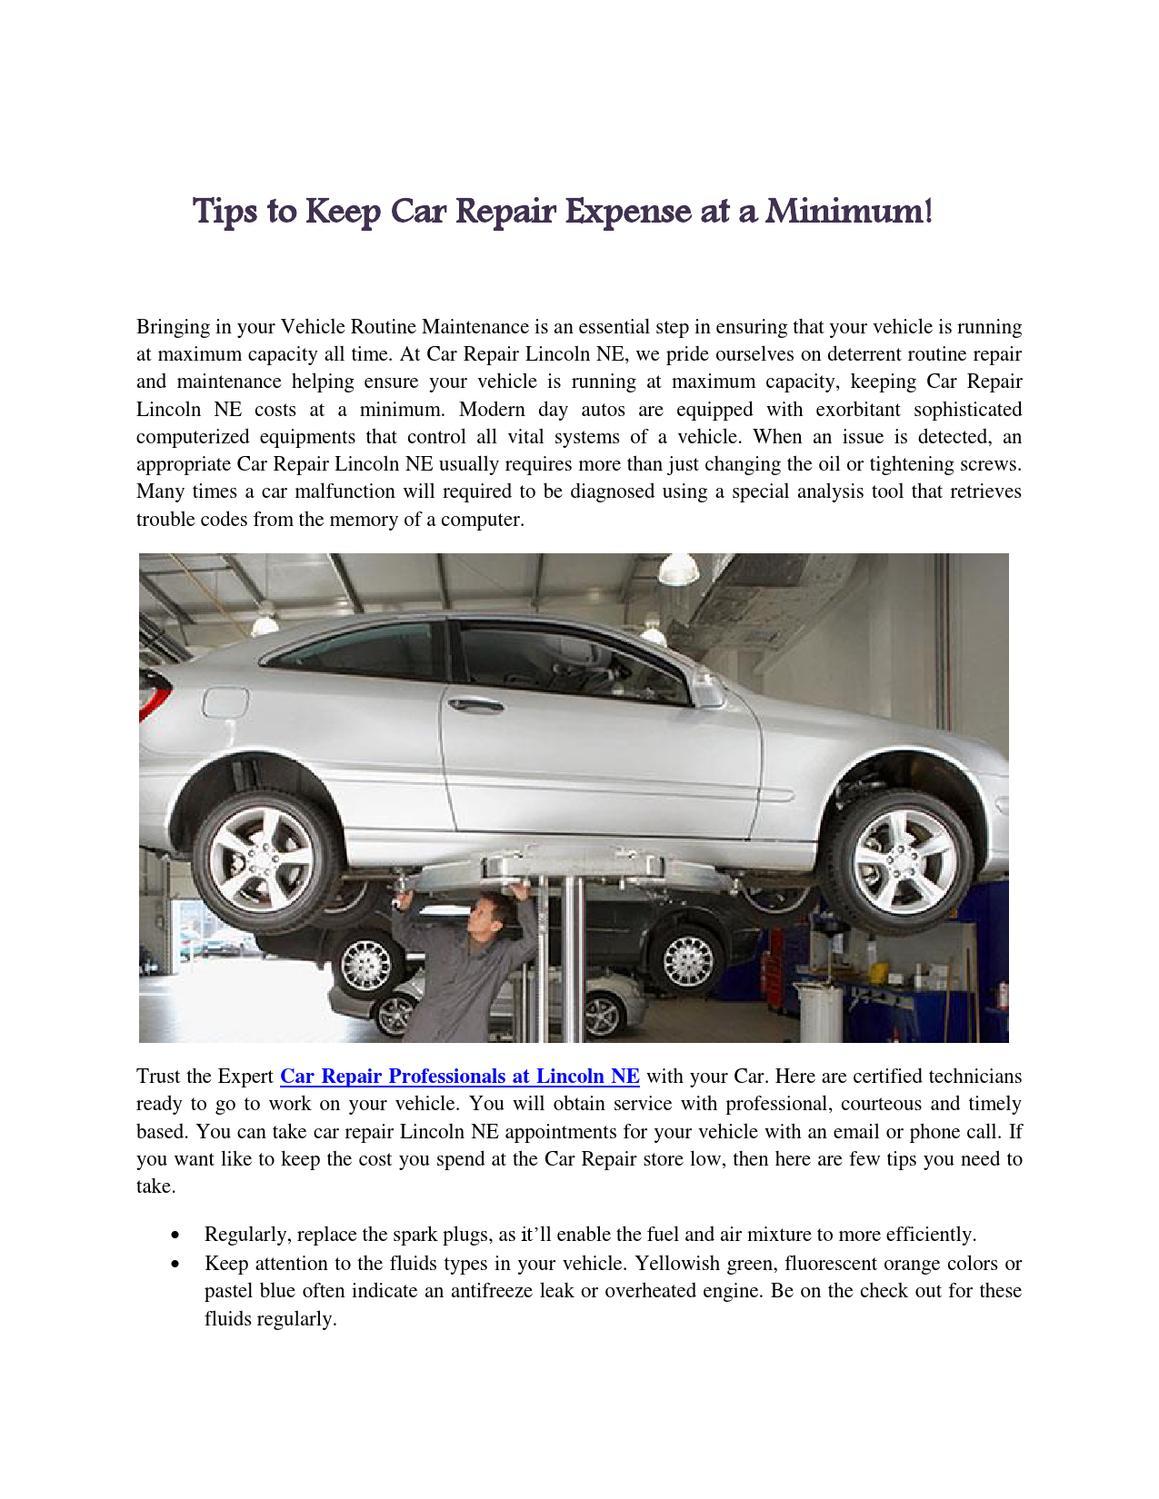 bmw and nexus automotive repair worksweb master3124 - issuu